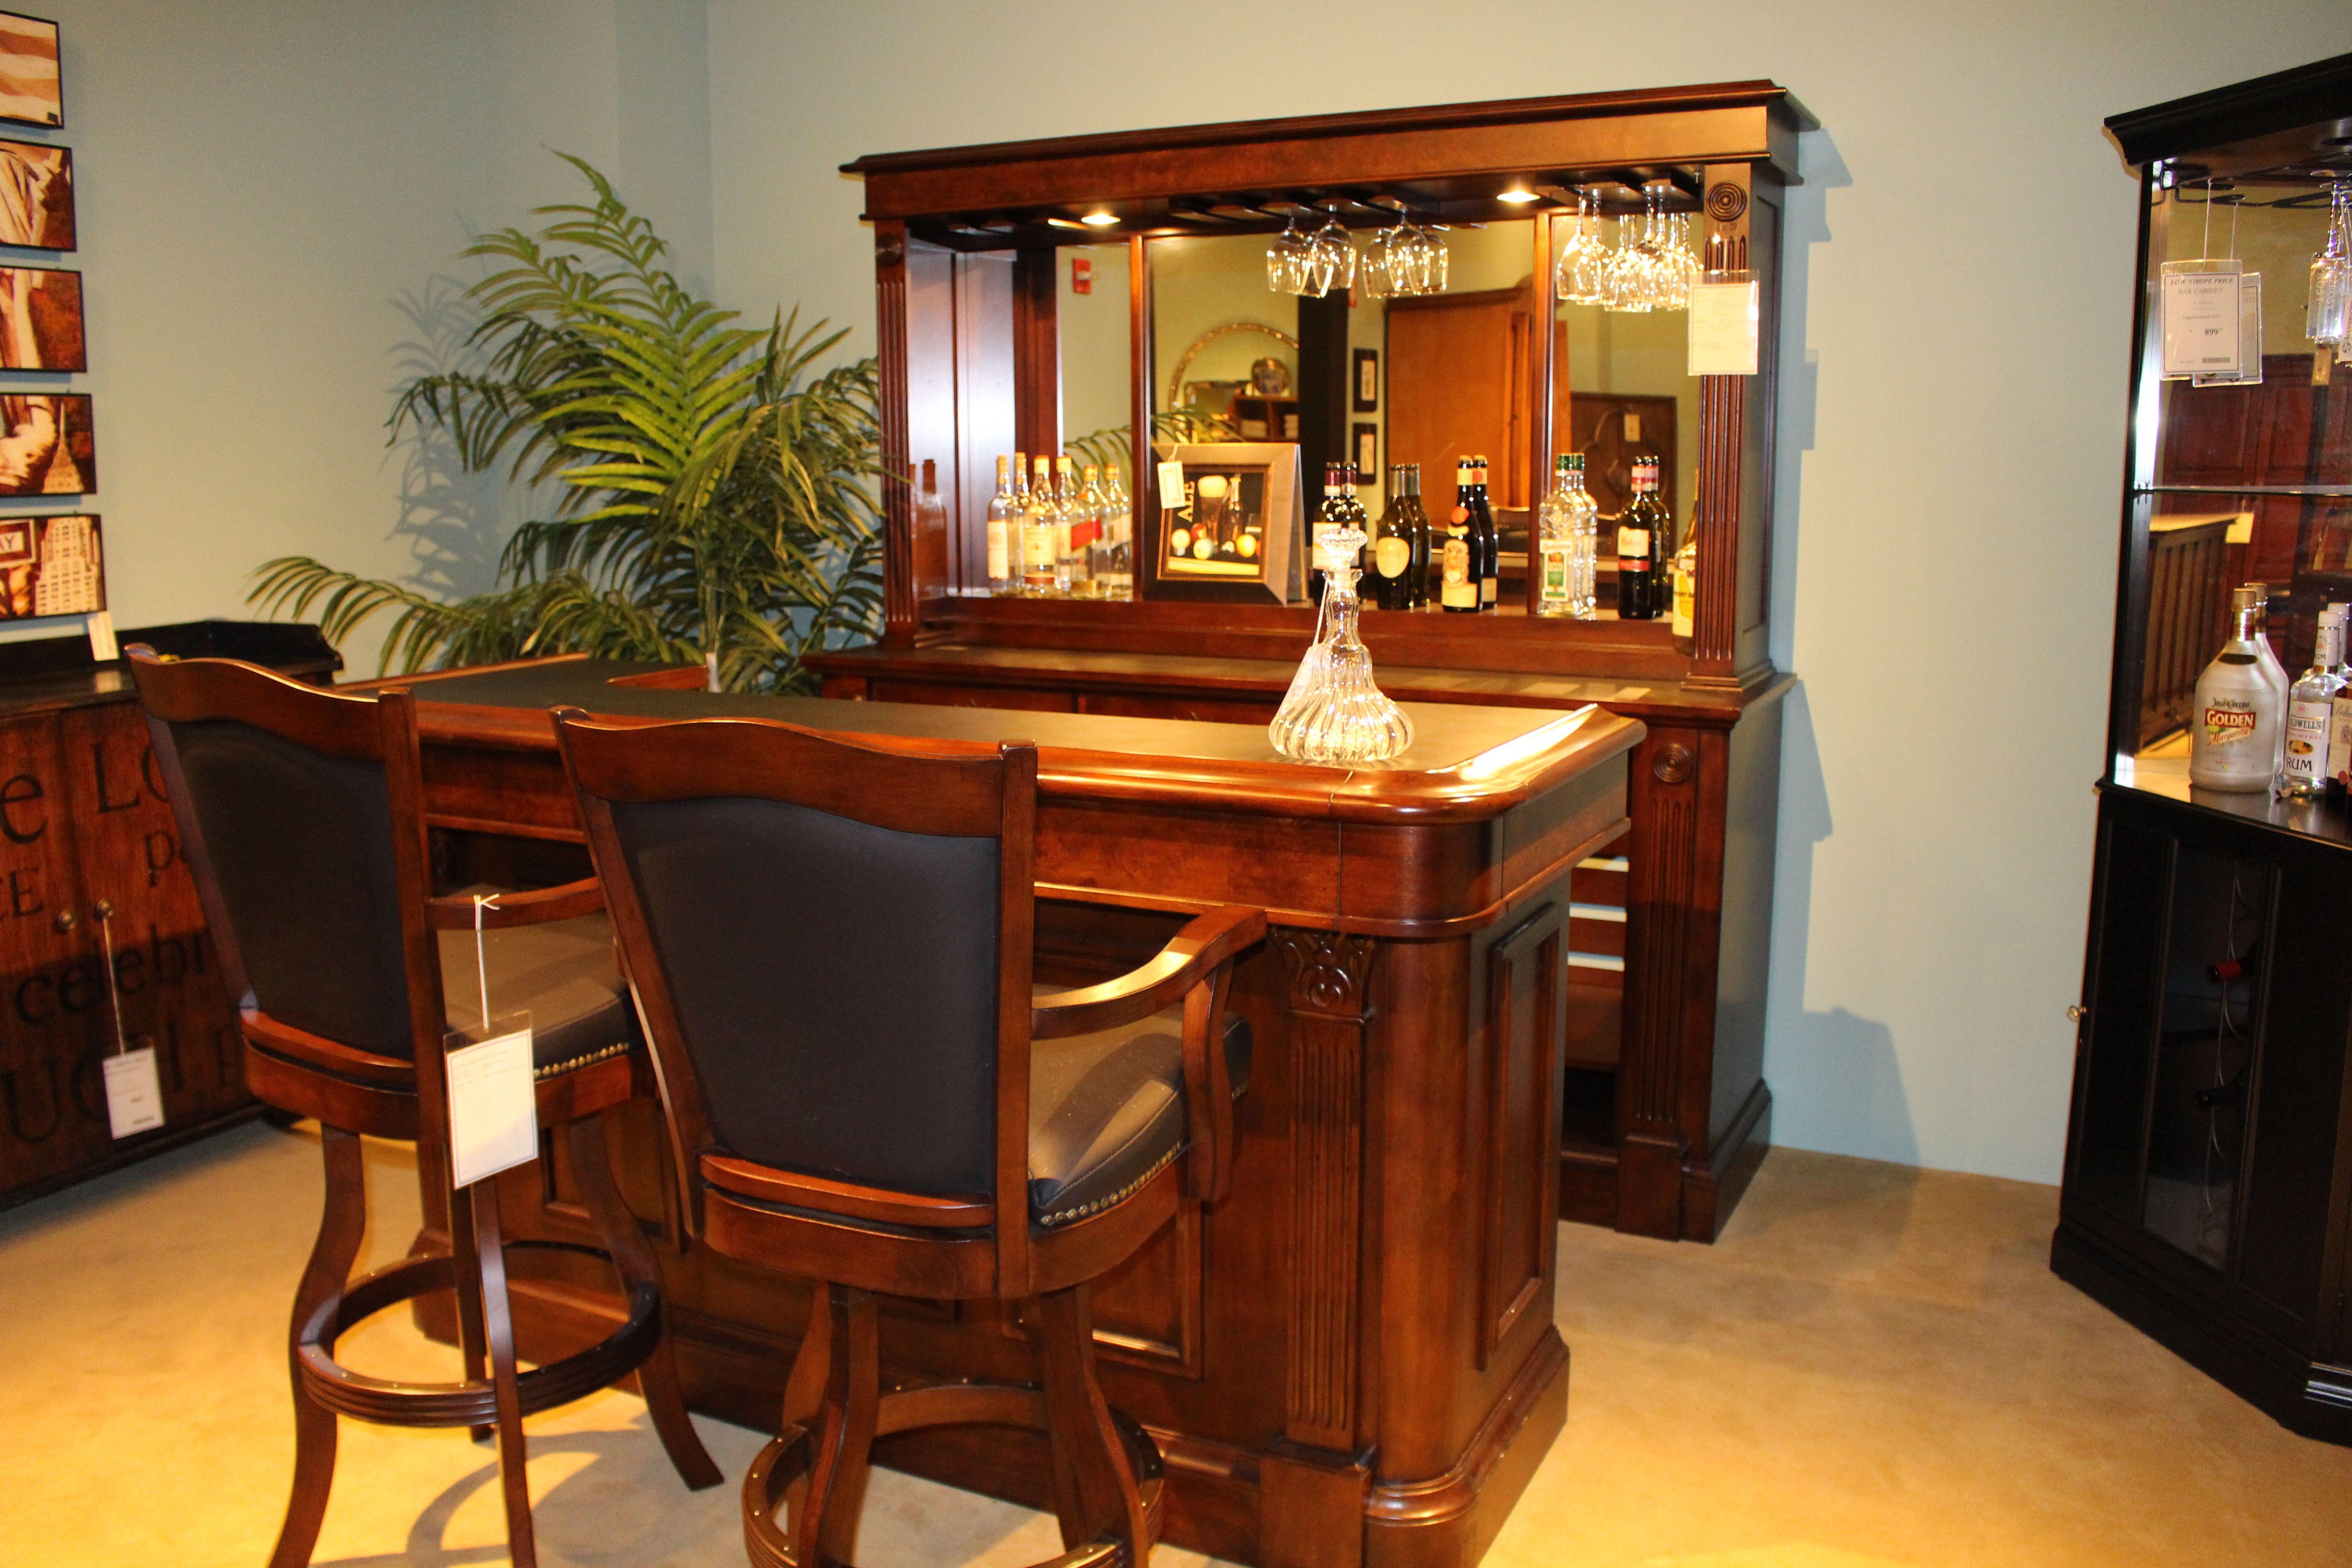 #Cardis #CardisFurniture #Furniture #Cocktail #CocktailCart #Beverage  #BeverageCart #Decor